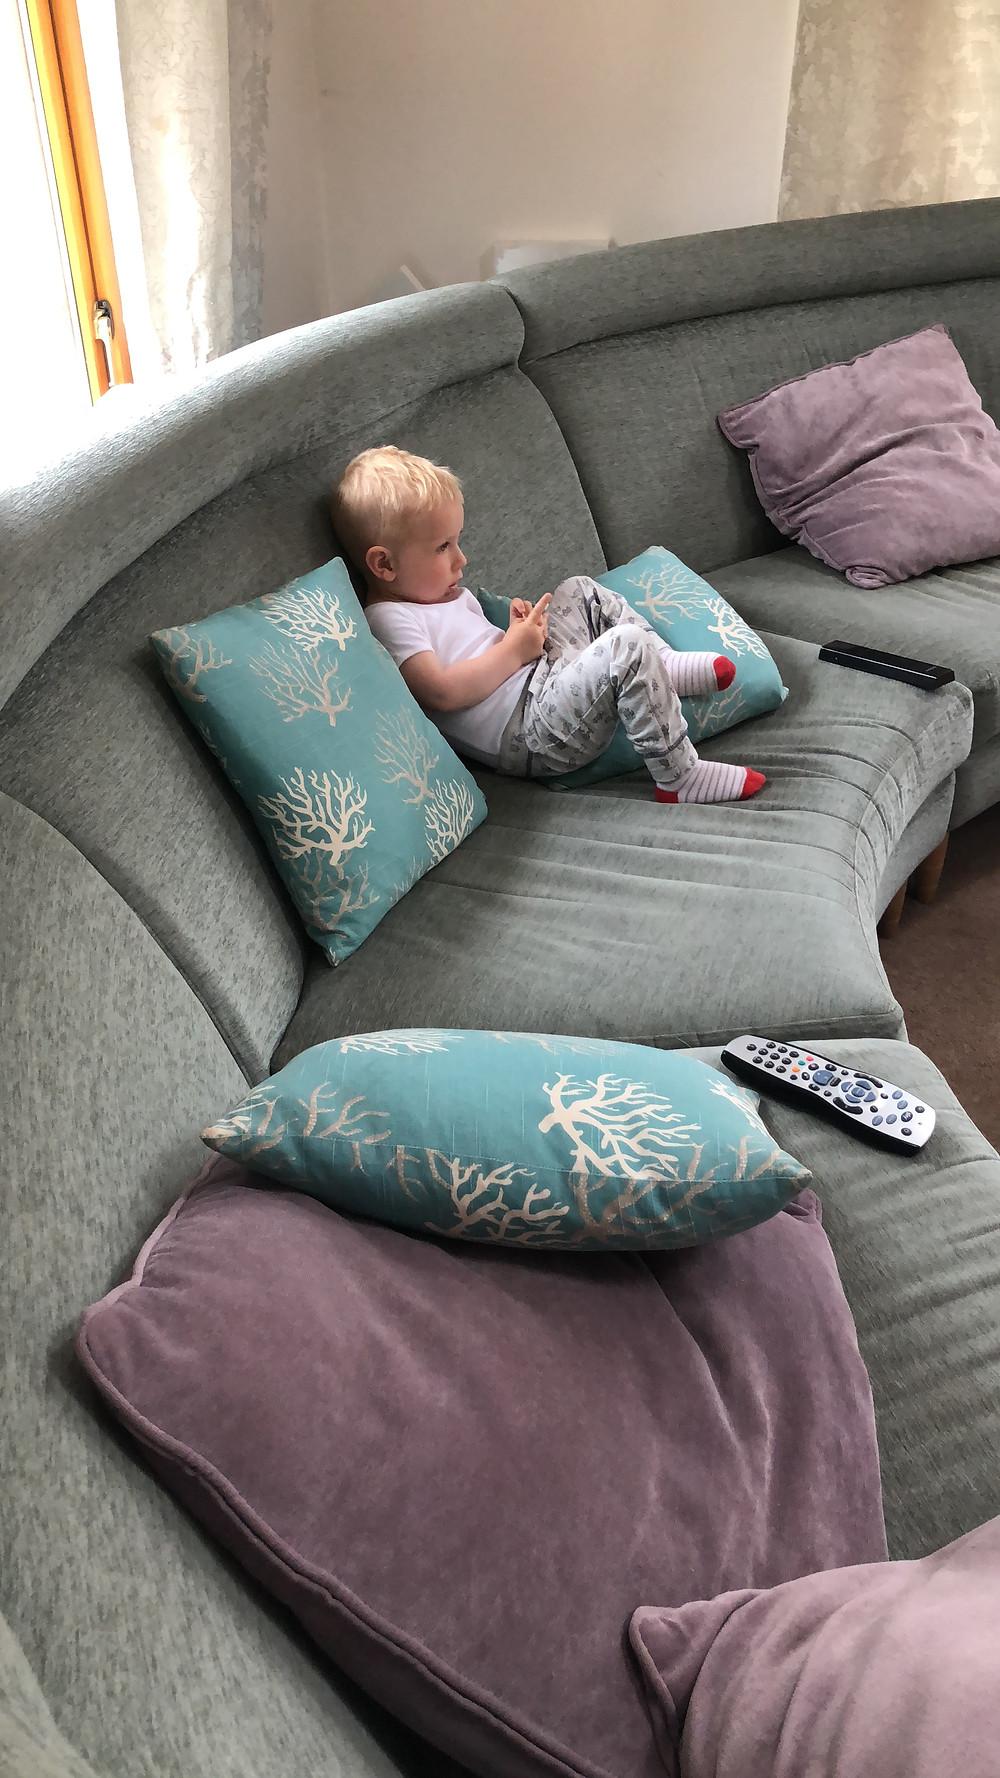 Best-aberdeen-family-children-photographer-montrose-arbroath-indoor-lifestyle-natural-light-boy-on-sofa